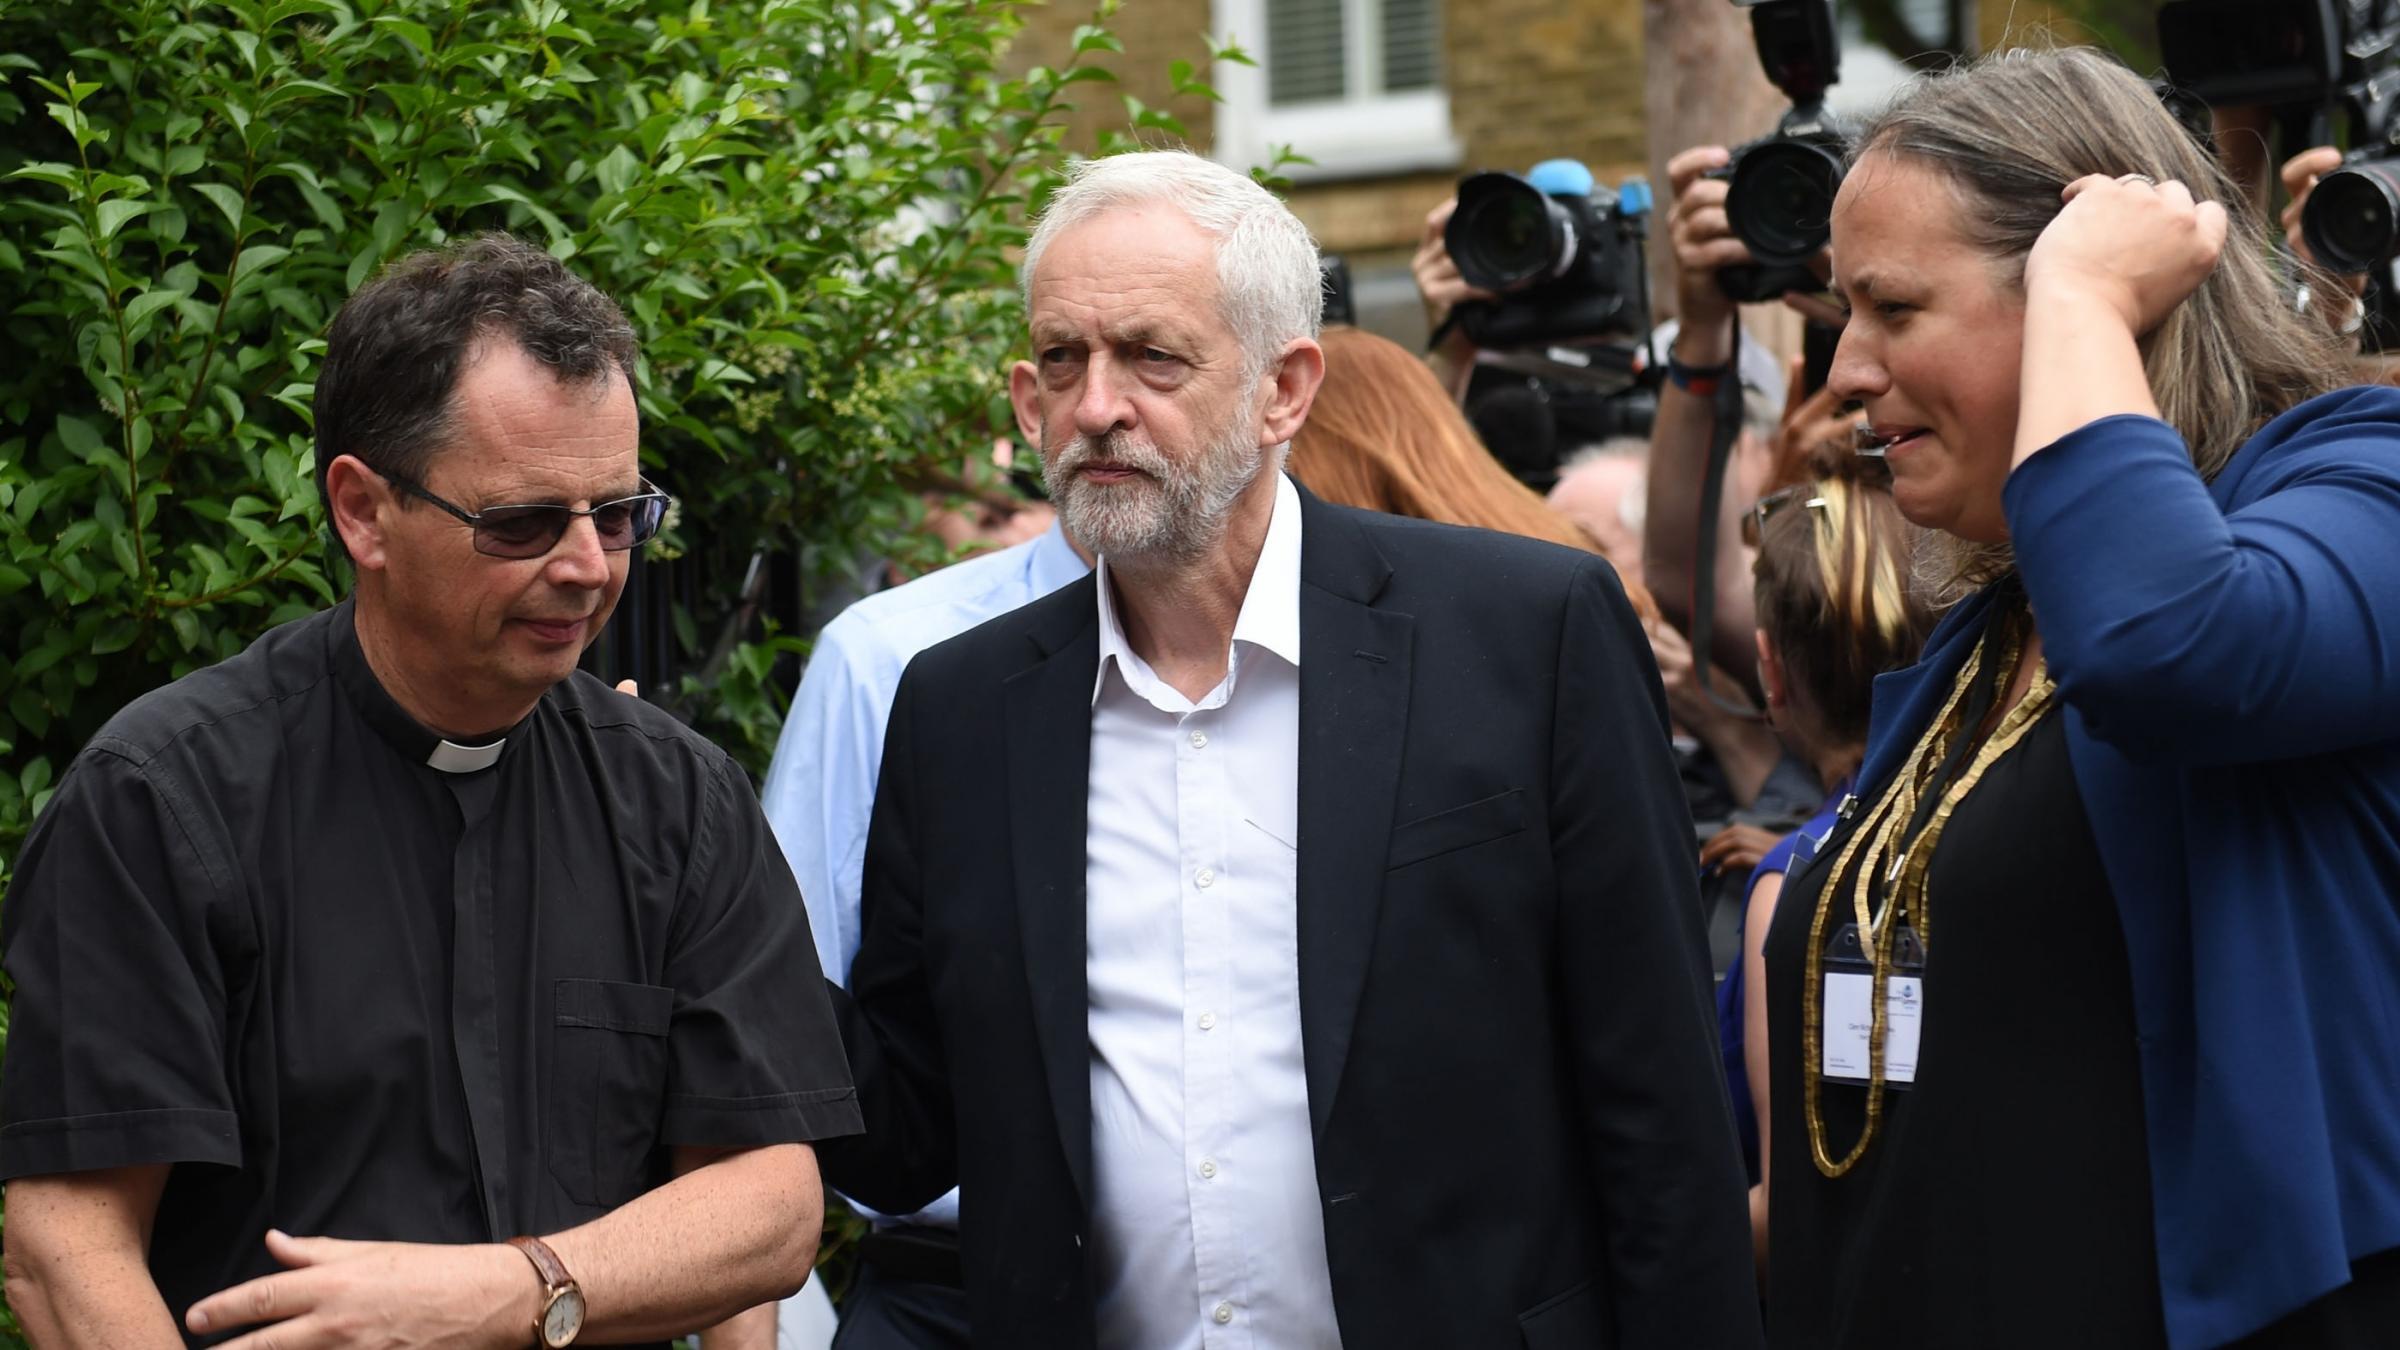 Finally, Britain kicks off Brexit negotiations with EU